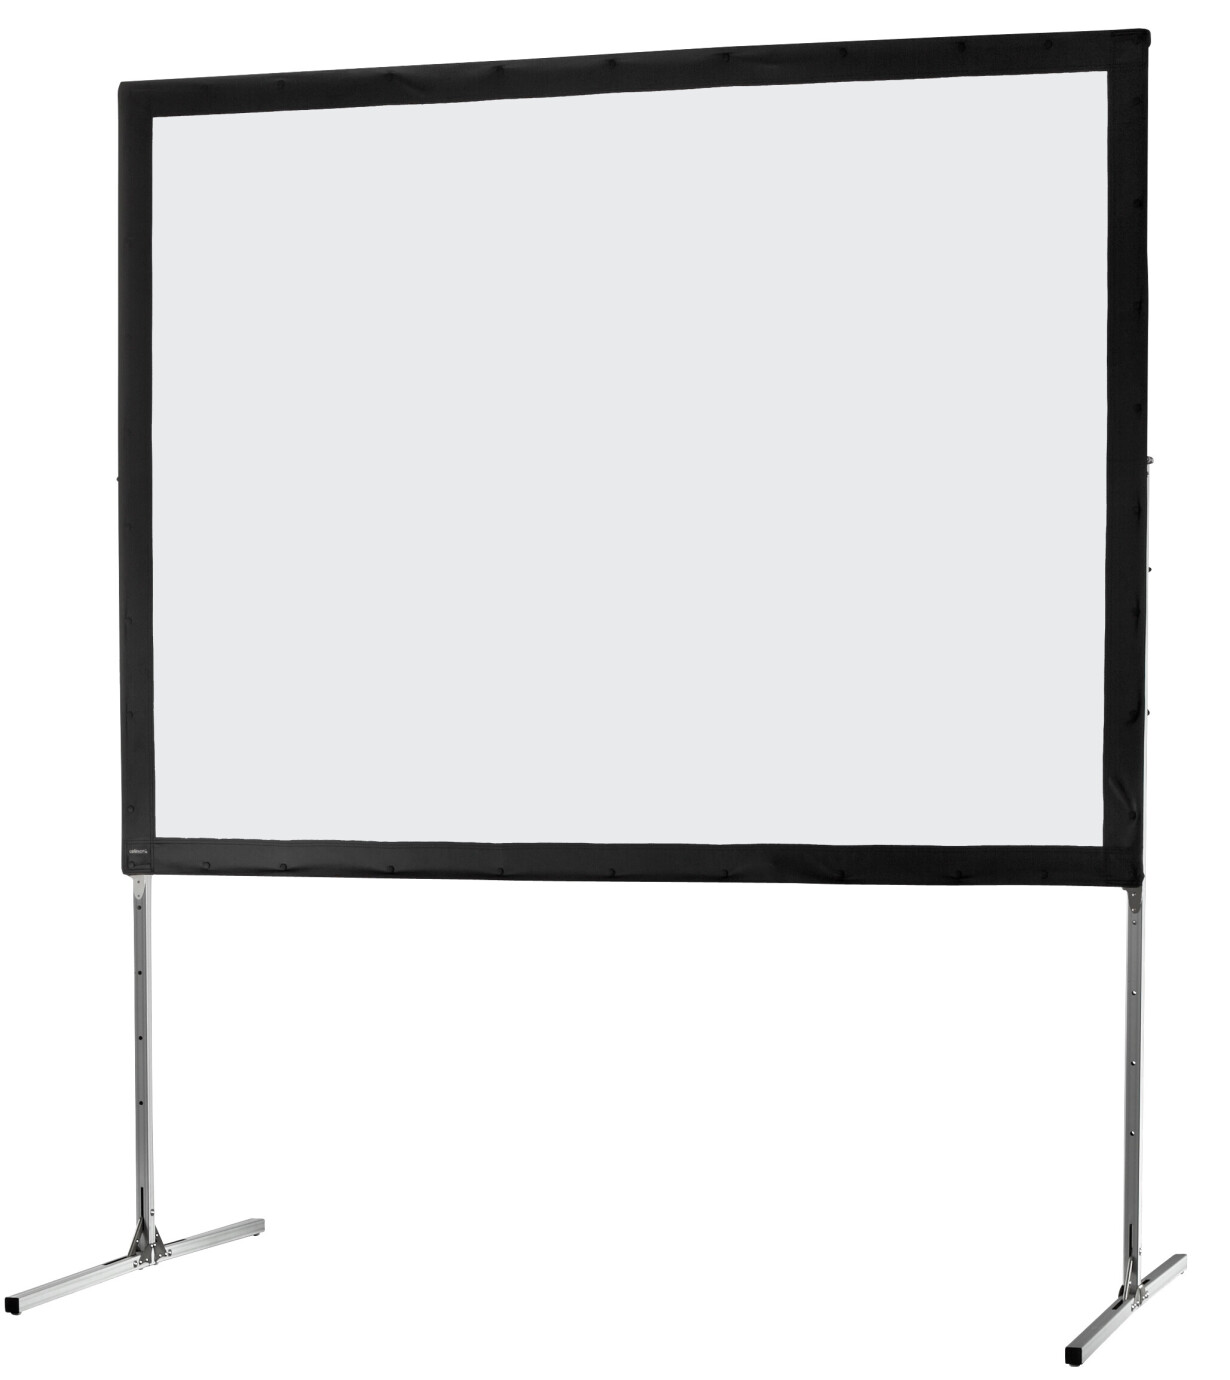 celexon Faltrahmen Leinwand Mobil Expert 366 x 274cm, Frontprojektion